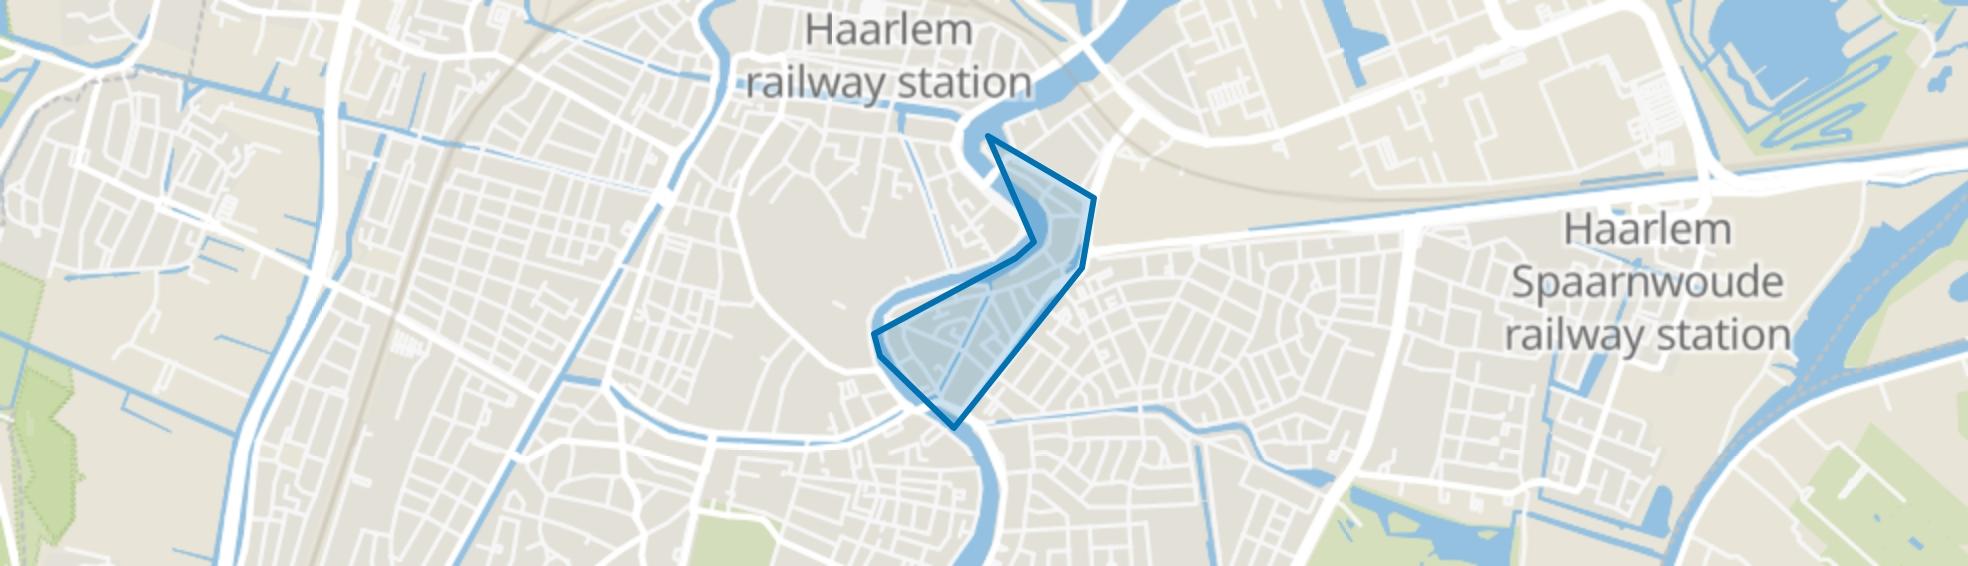 Burgwal, Haarlem map